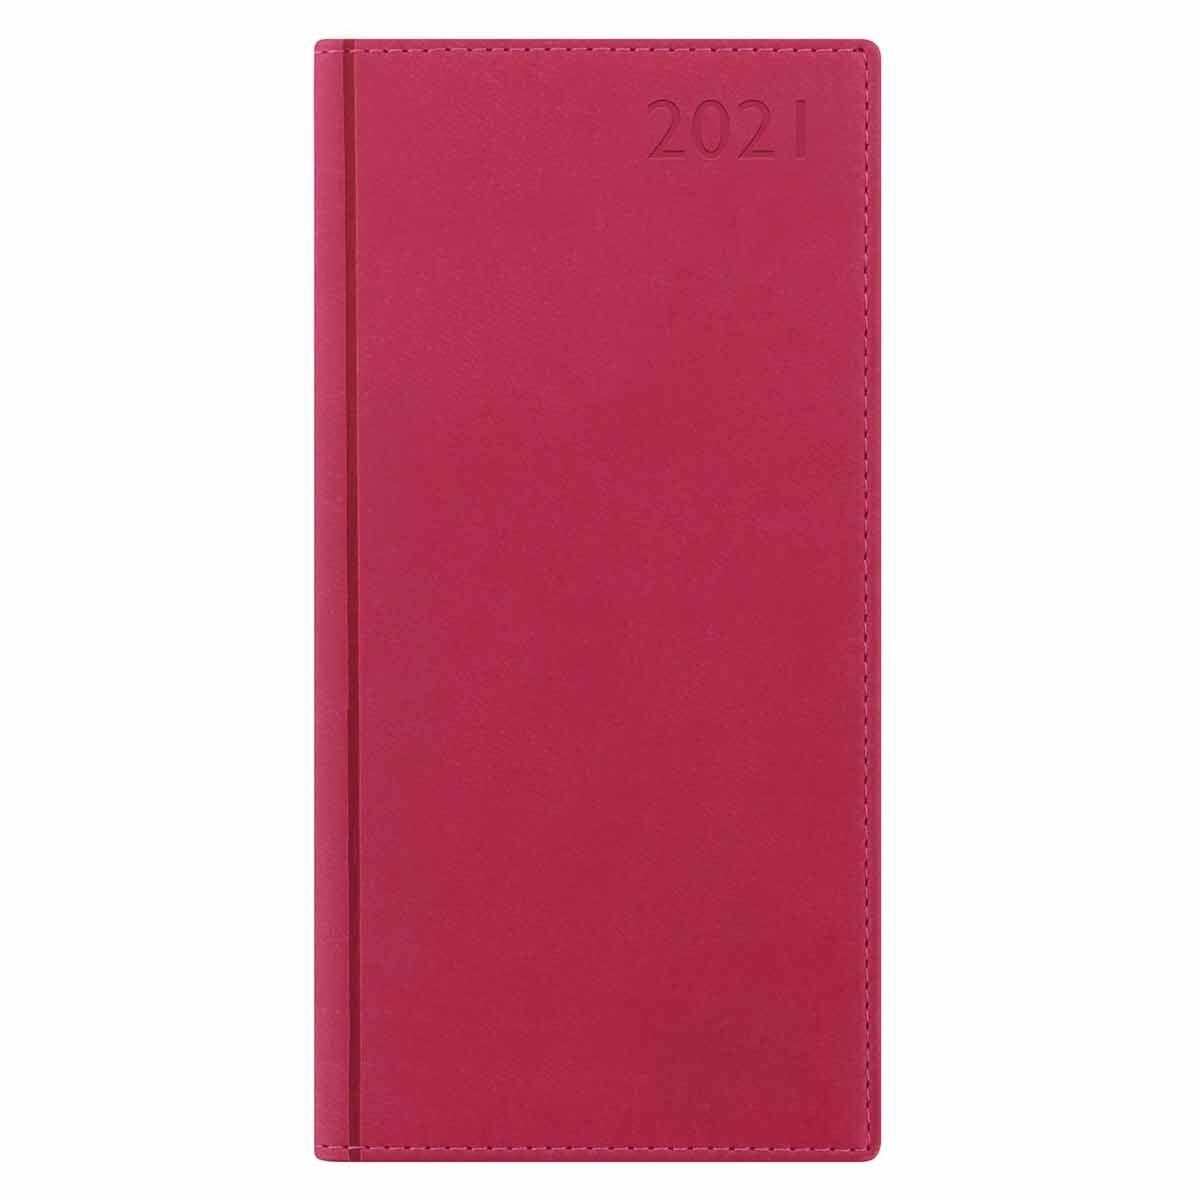 Letts Verona Diary Week to View Slim 2021 Raspberry